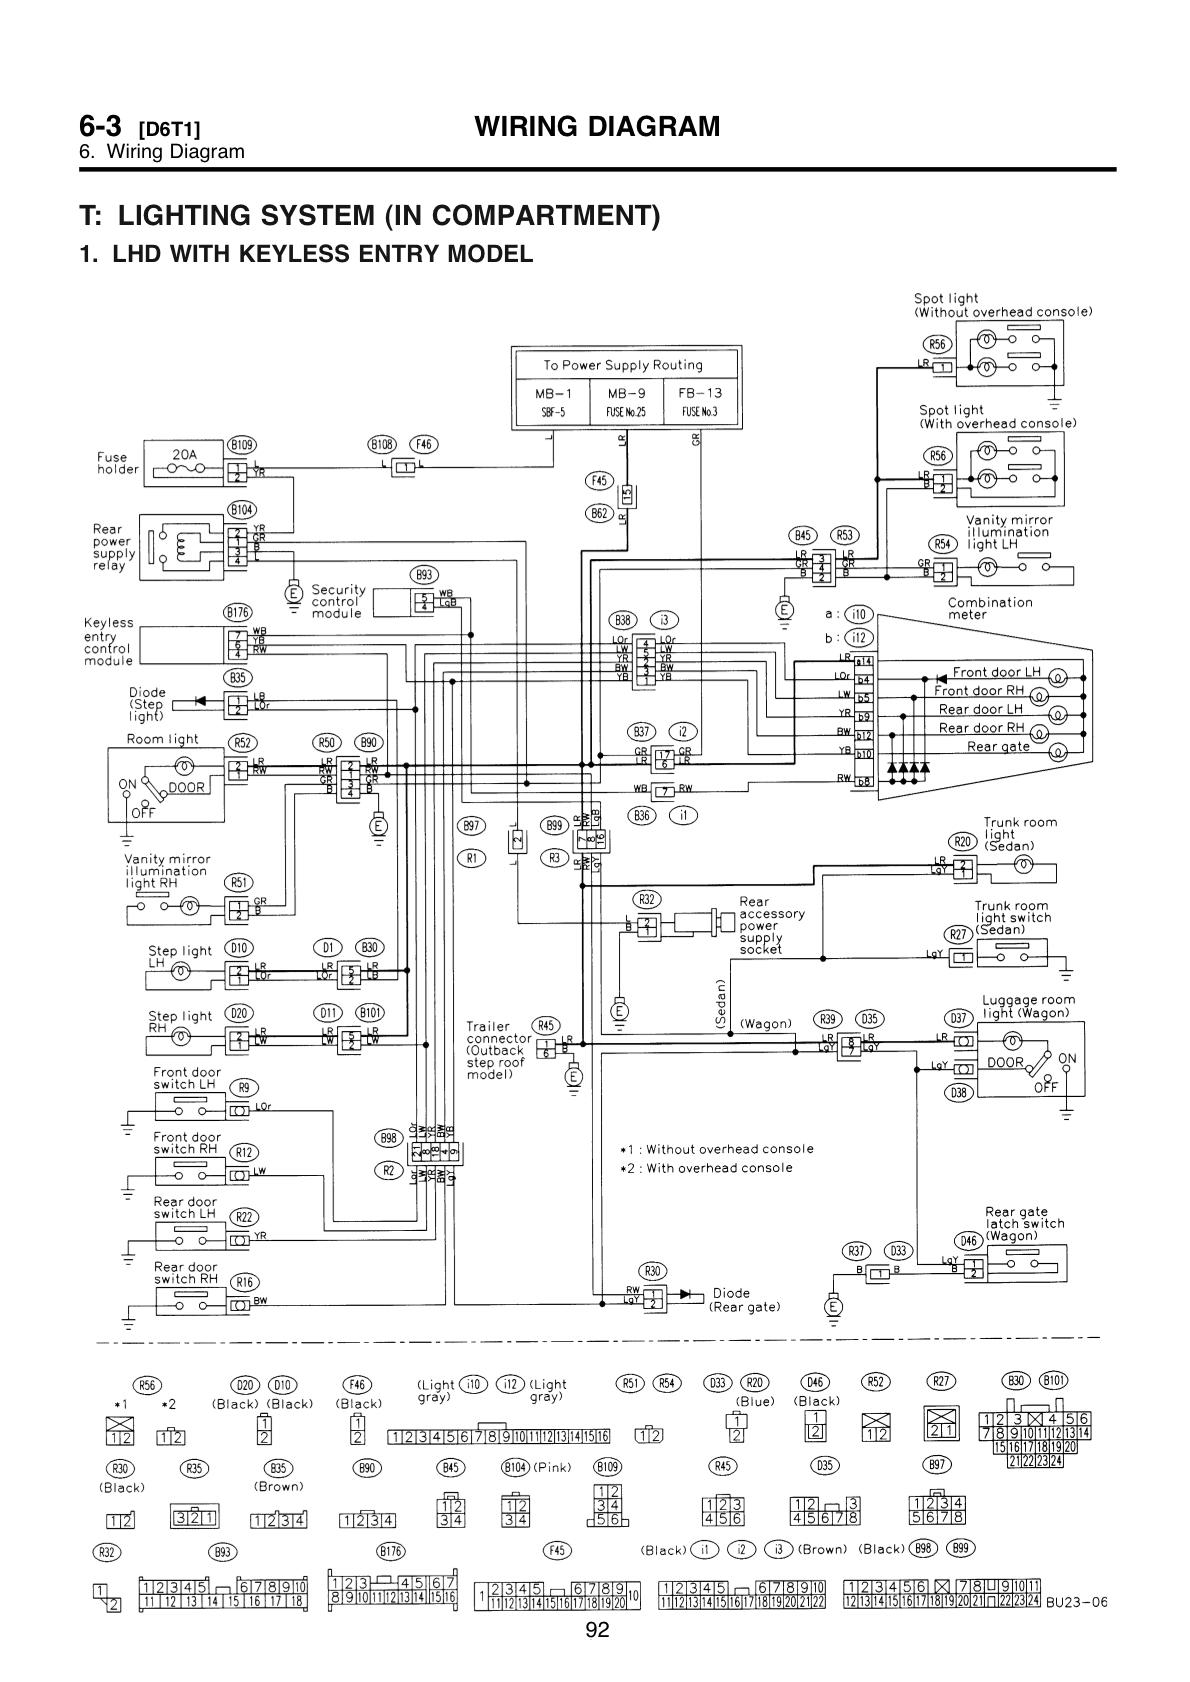 2008 Subaru Impreza Radio Wiring Diagram Subaru Sti Wiring Diagram Blog Wiring Diagram